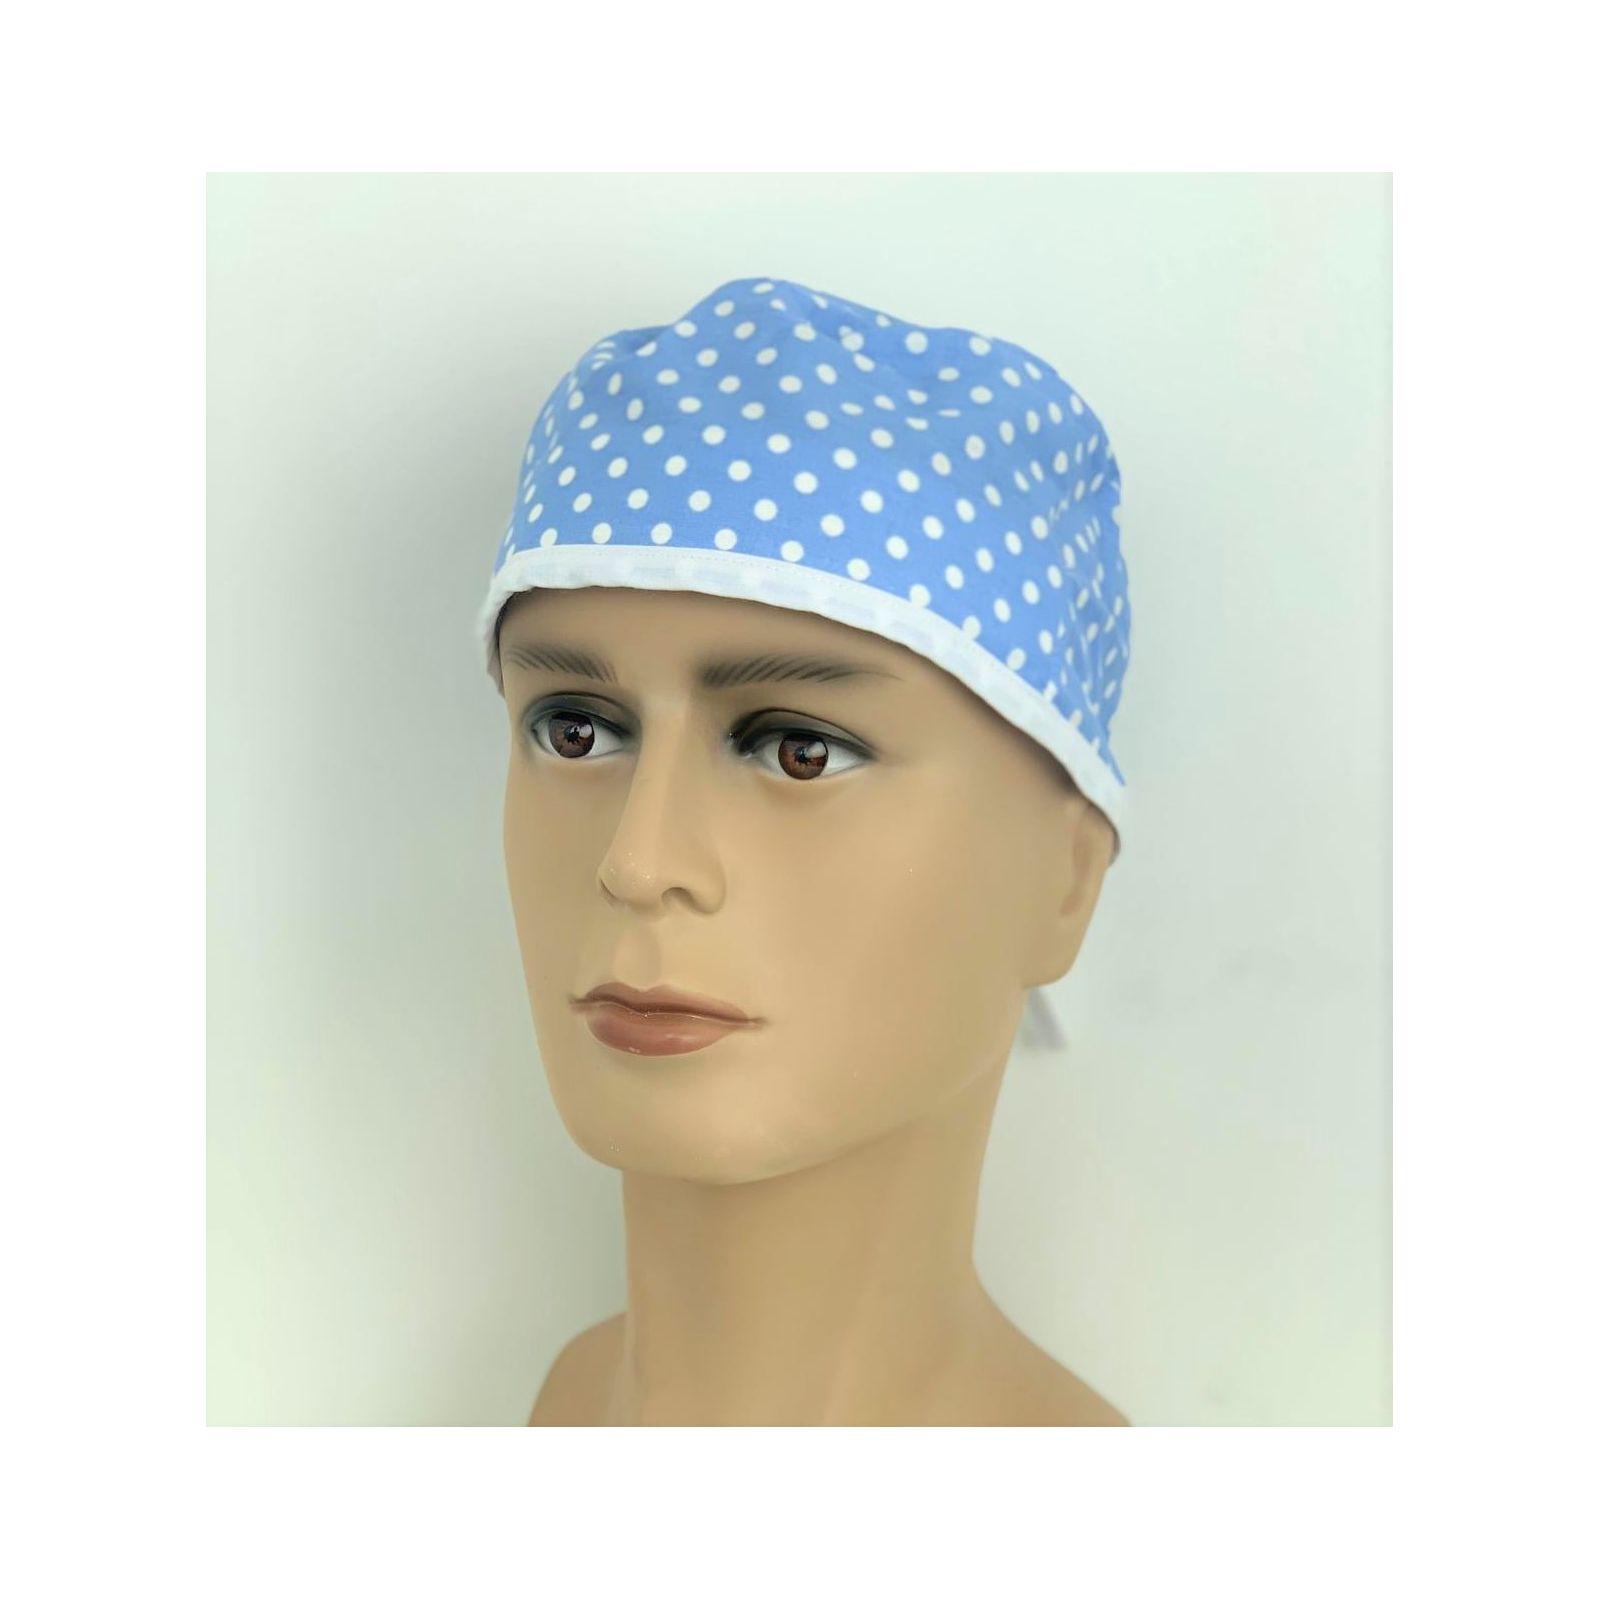 "Calot médical ""Pois fond bleu"" (210-9996)"